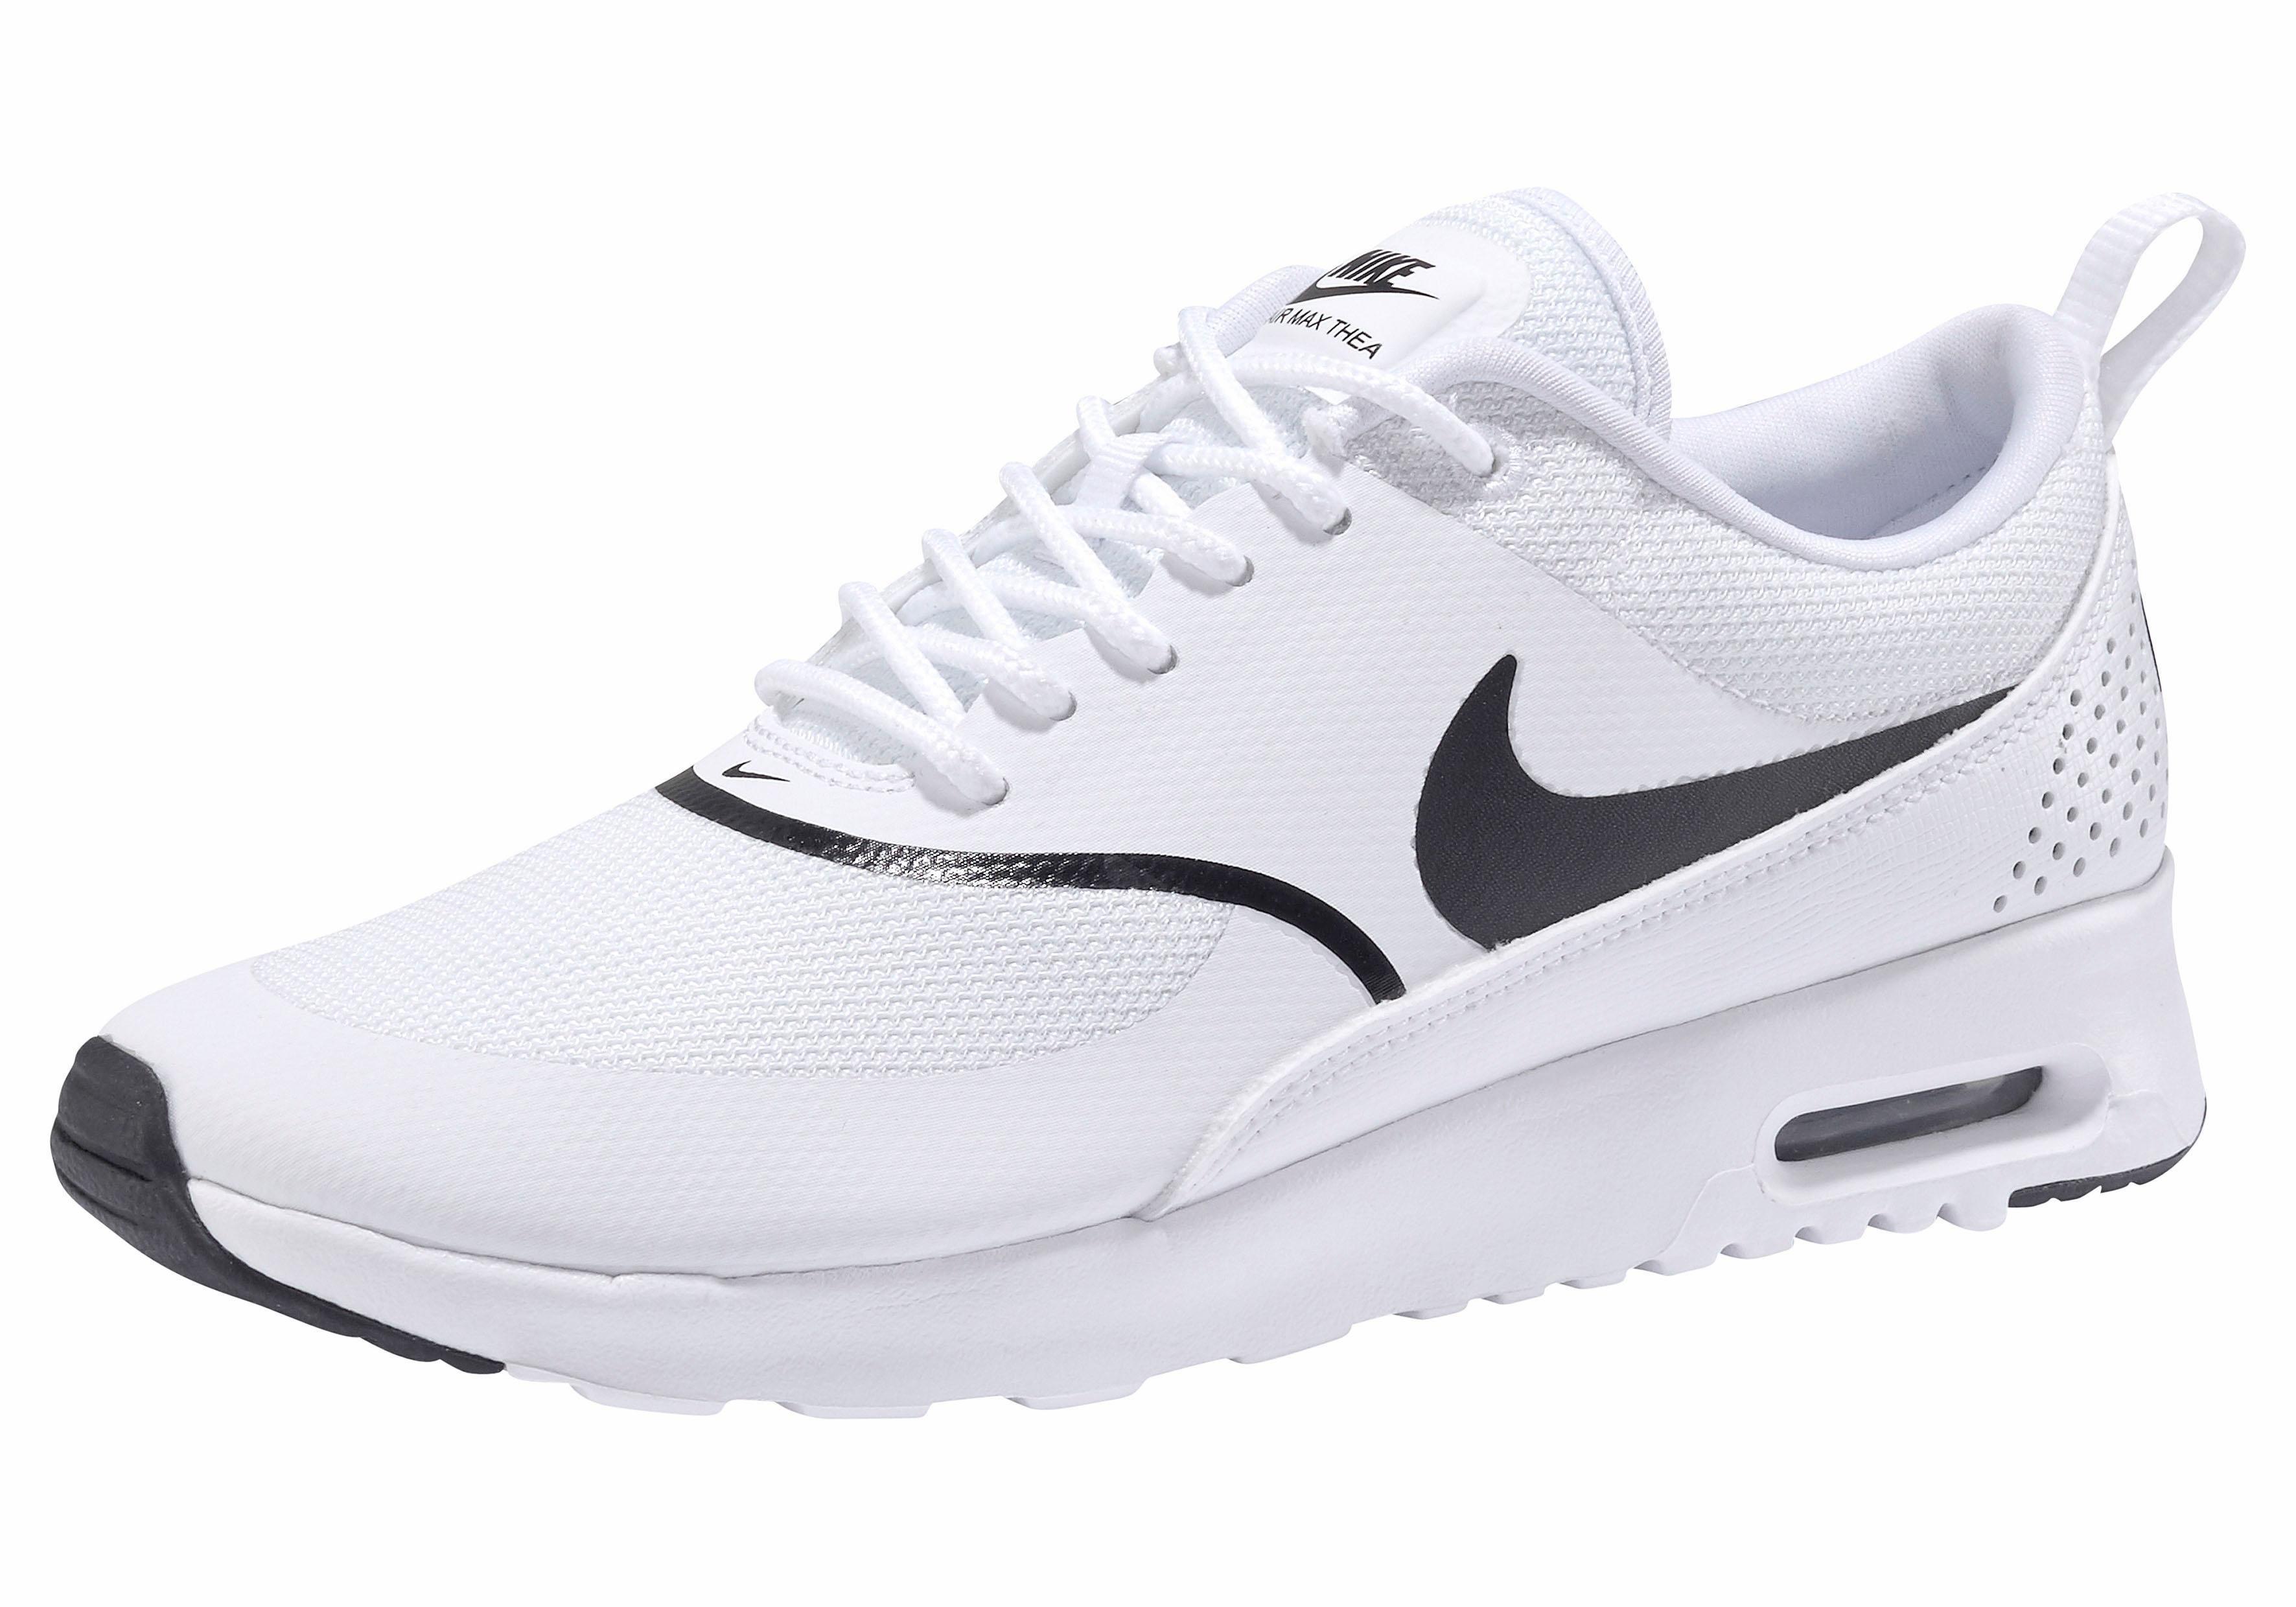 pretty nice 042f6 8de9c Afbeeldingsbron  Nike Sportswear sneakers »Air Max Thea«